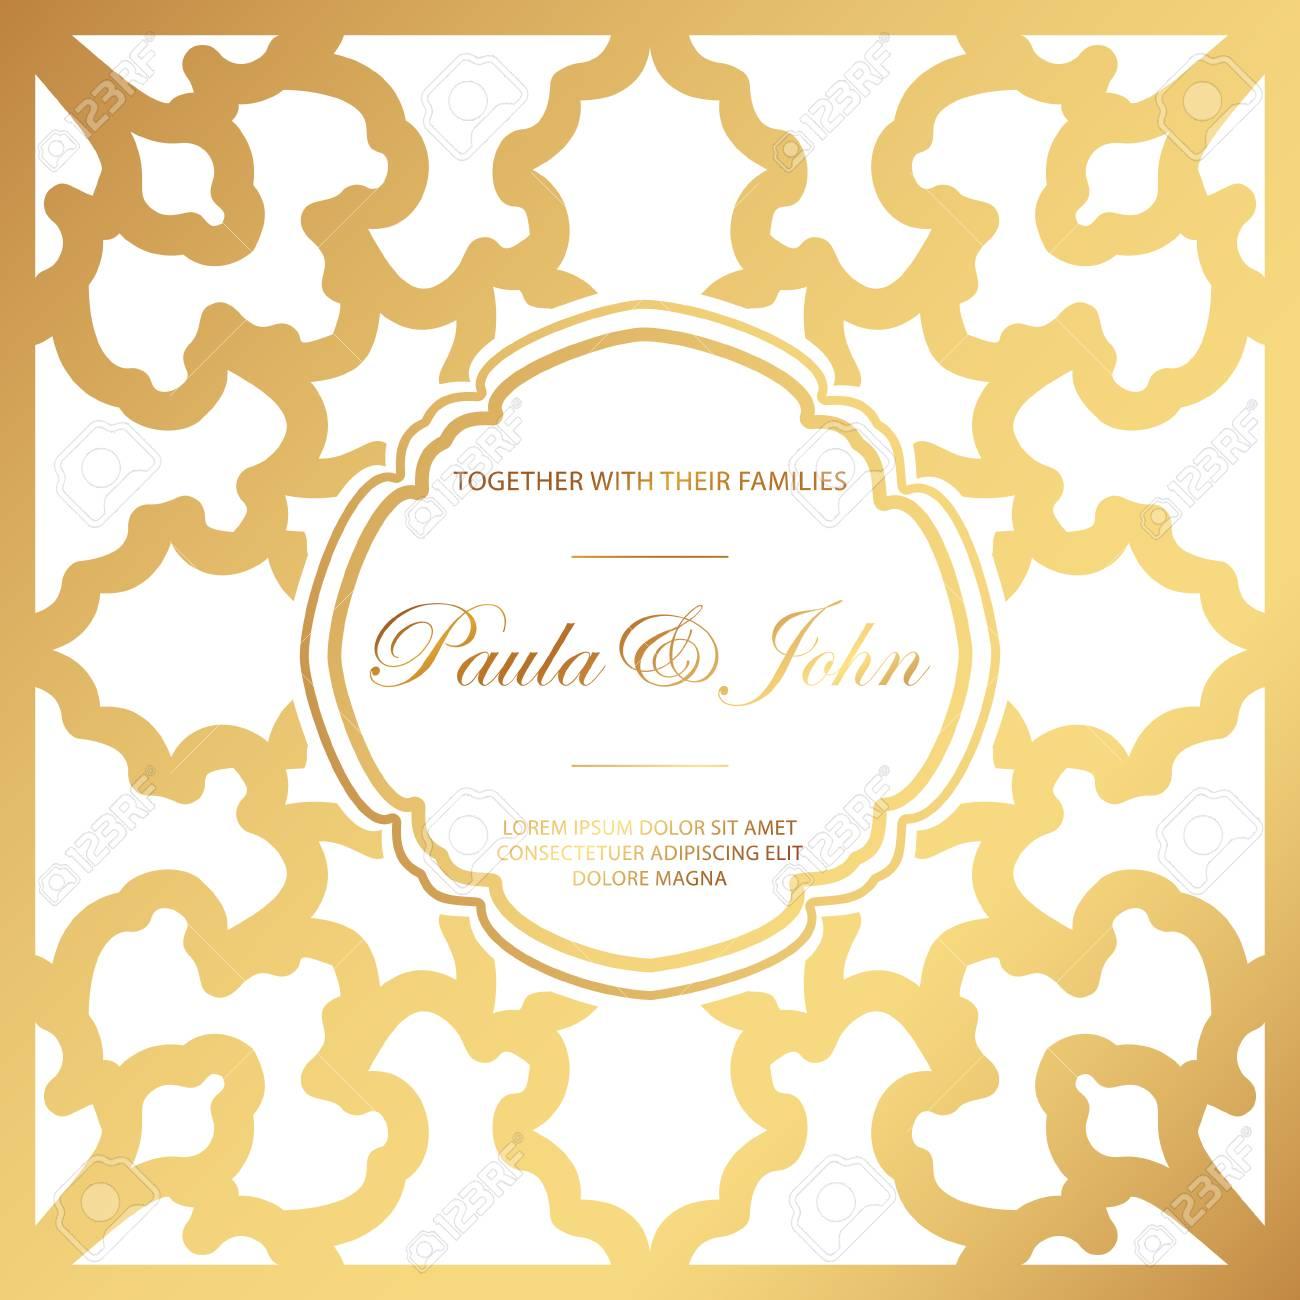 Stylish gold and white wedding card royal vintage wedding stylish gold and white wedding card royal vintage wedding invitation template save the date stopboris Images